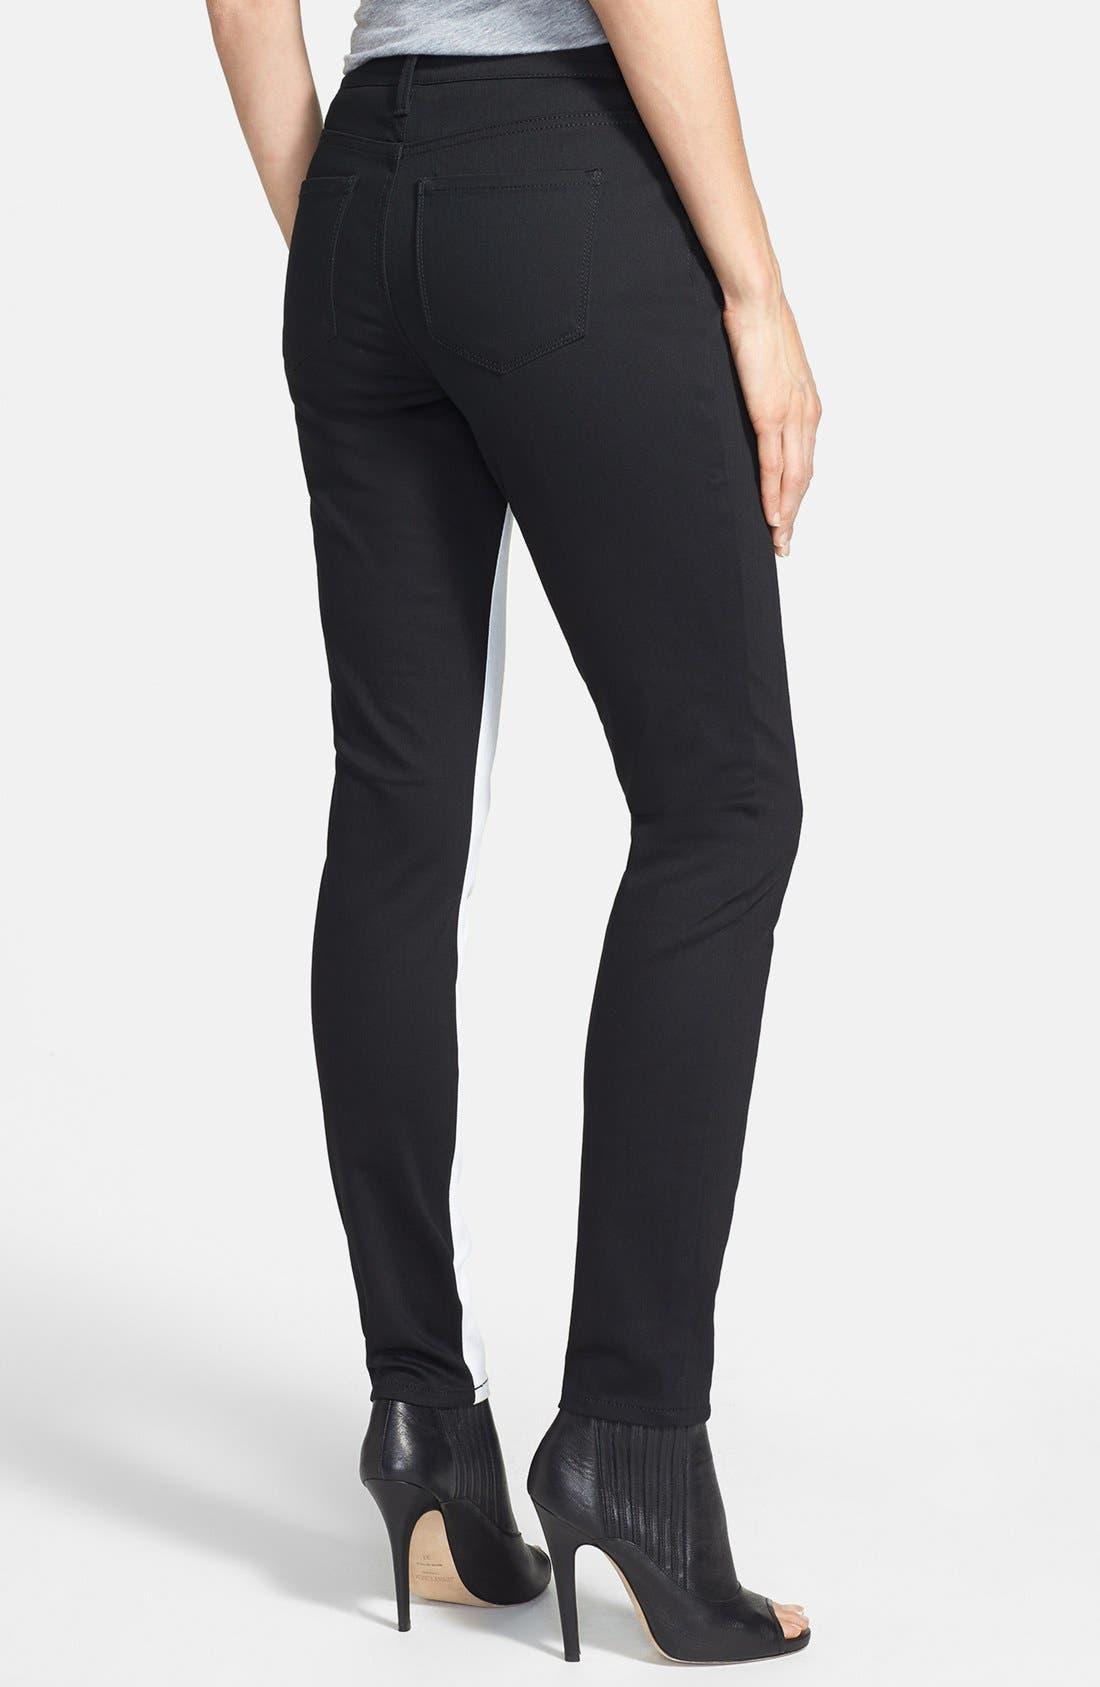 Alternate Image 2  - NYDJ 'Aurora' Two-Tone Stretch Skinny Jeans (Optic White/Black)